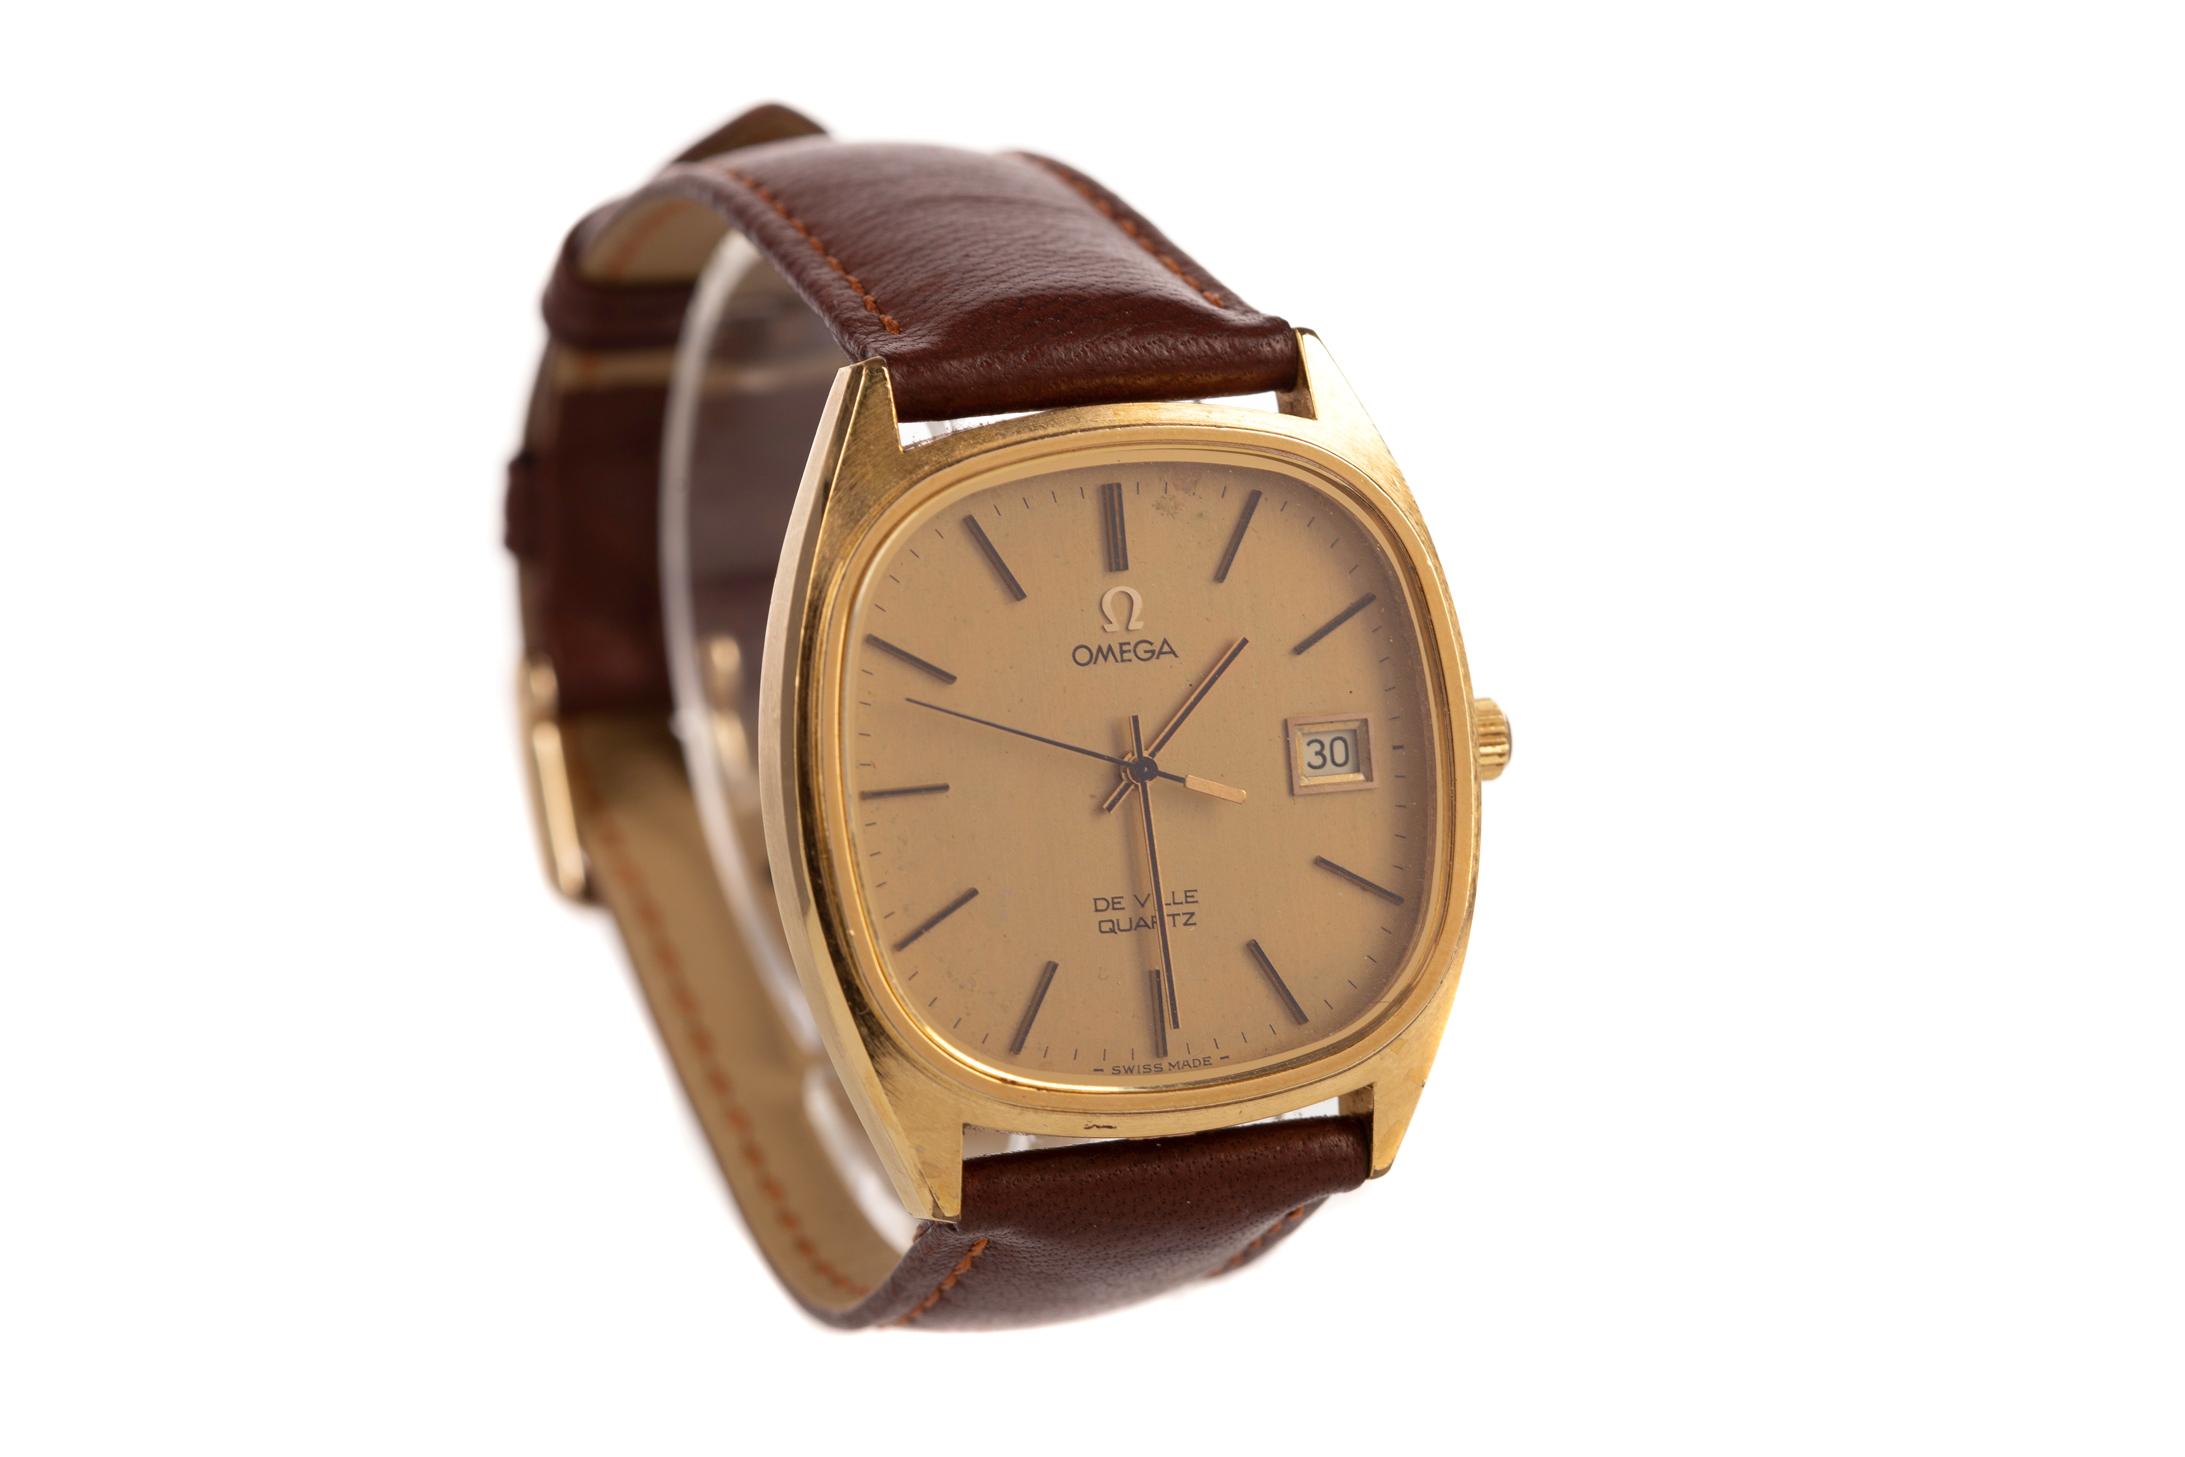 GENTLEMAN'S OMEGA DE VILLE GOLD PLATED QUARTZ WRIST WATCH, the gold coloured cushion shaped dial